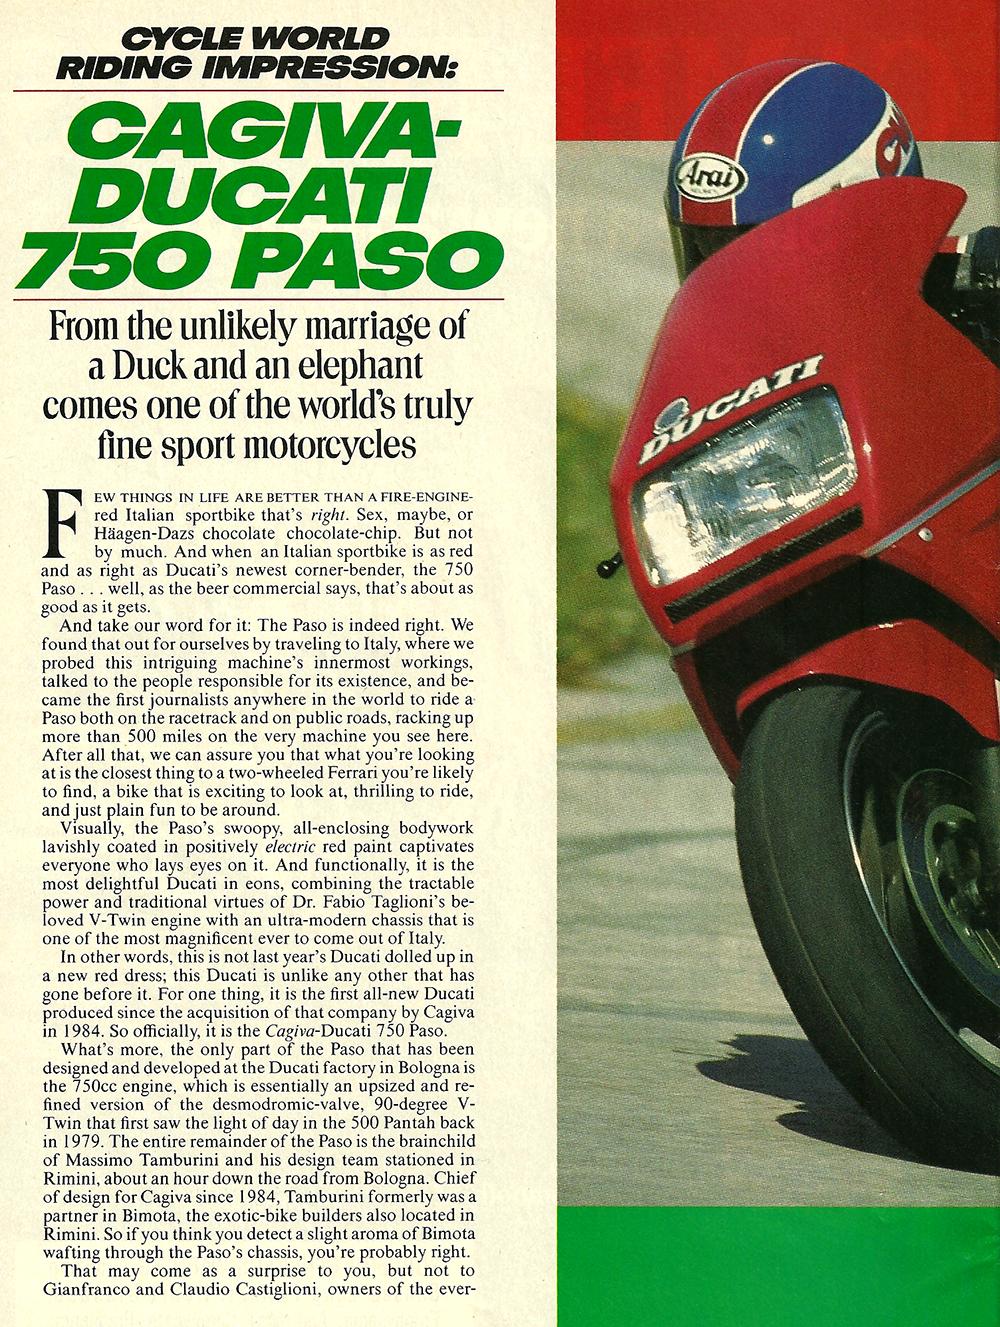 1986 Cagiva-Ducati 750 Paso road test 01.jpg